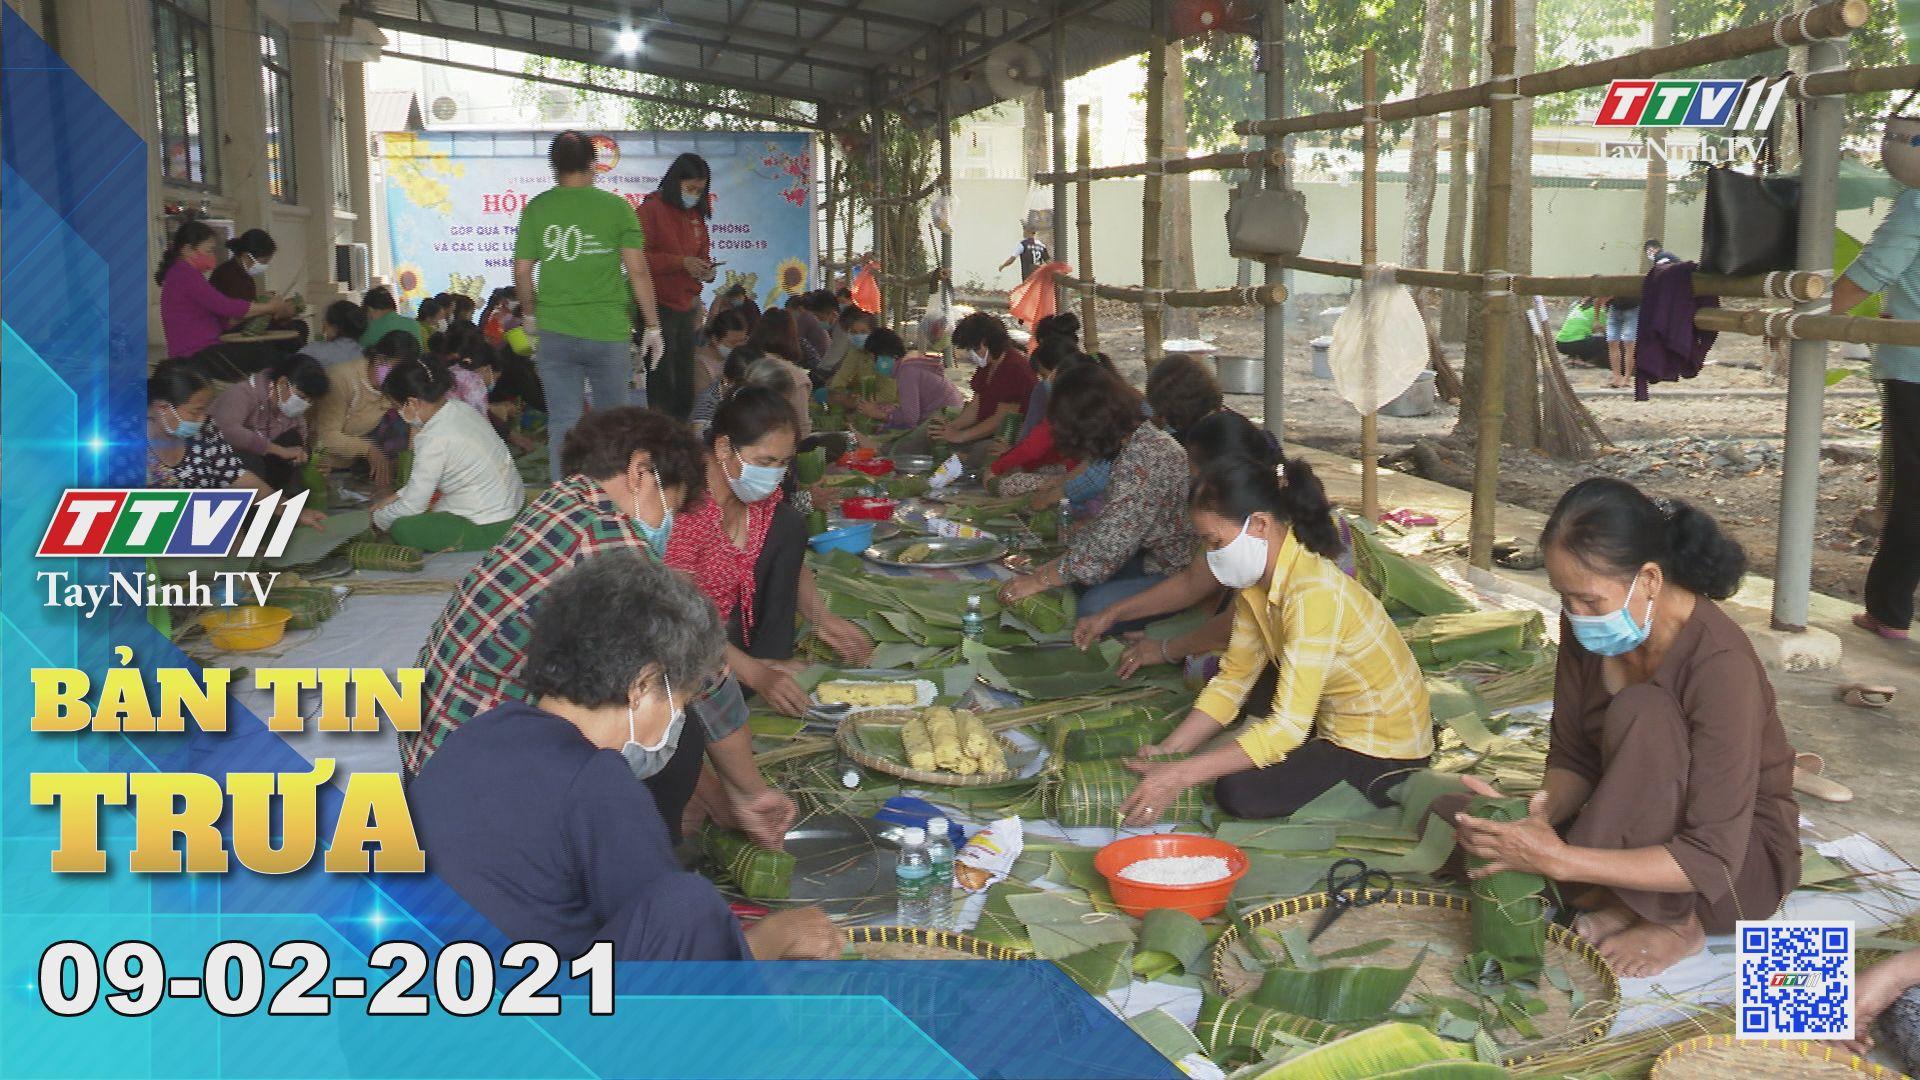 Bản tin trưa 09-02-2021 | Tin tức hôm nay | TayNinhTV